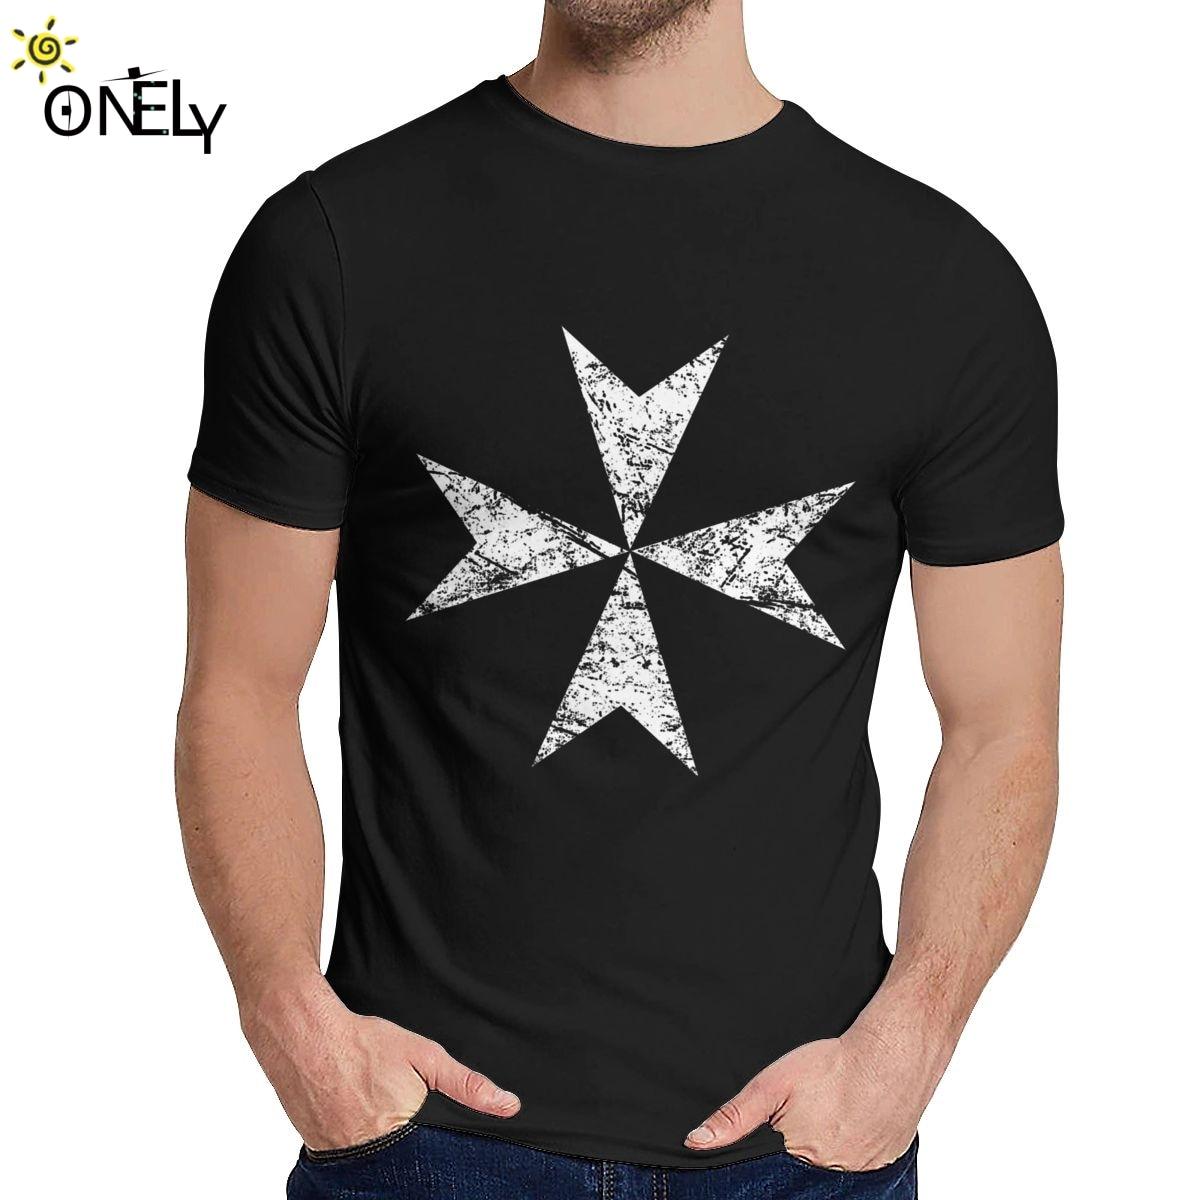 Cuello redondo, Caballeros Templarios, cruzado, camiseta cruzada maltés, camiseta Vintage para hombres, Camiseta de algodón, Envío Gratis